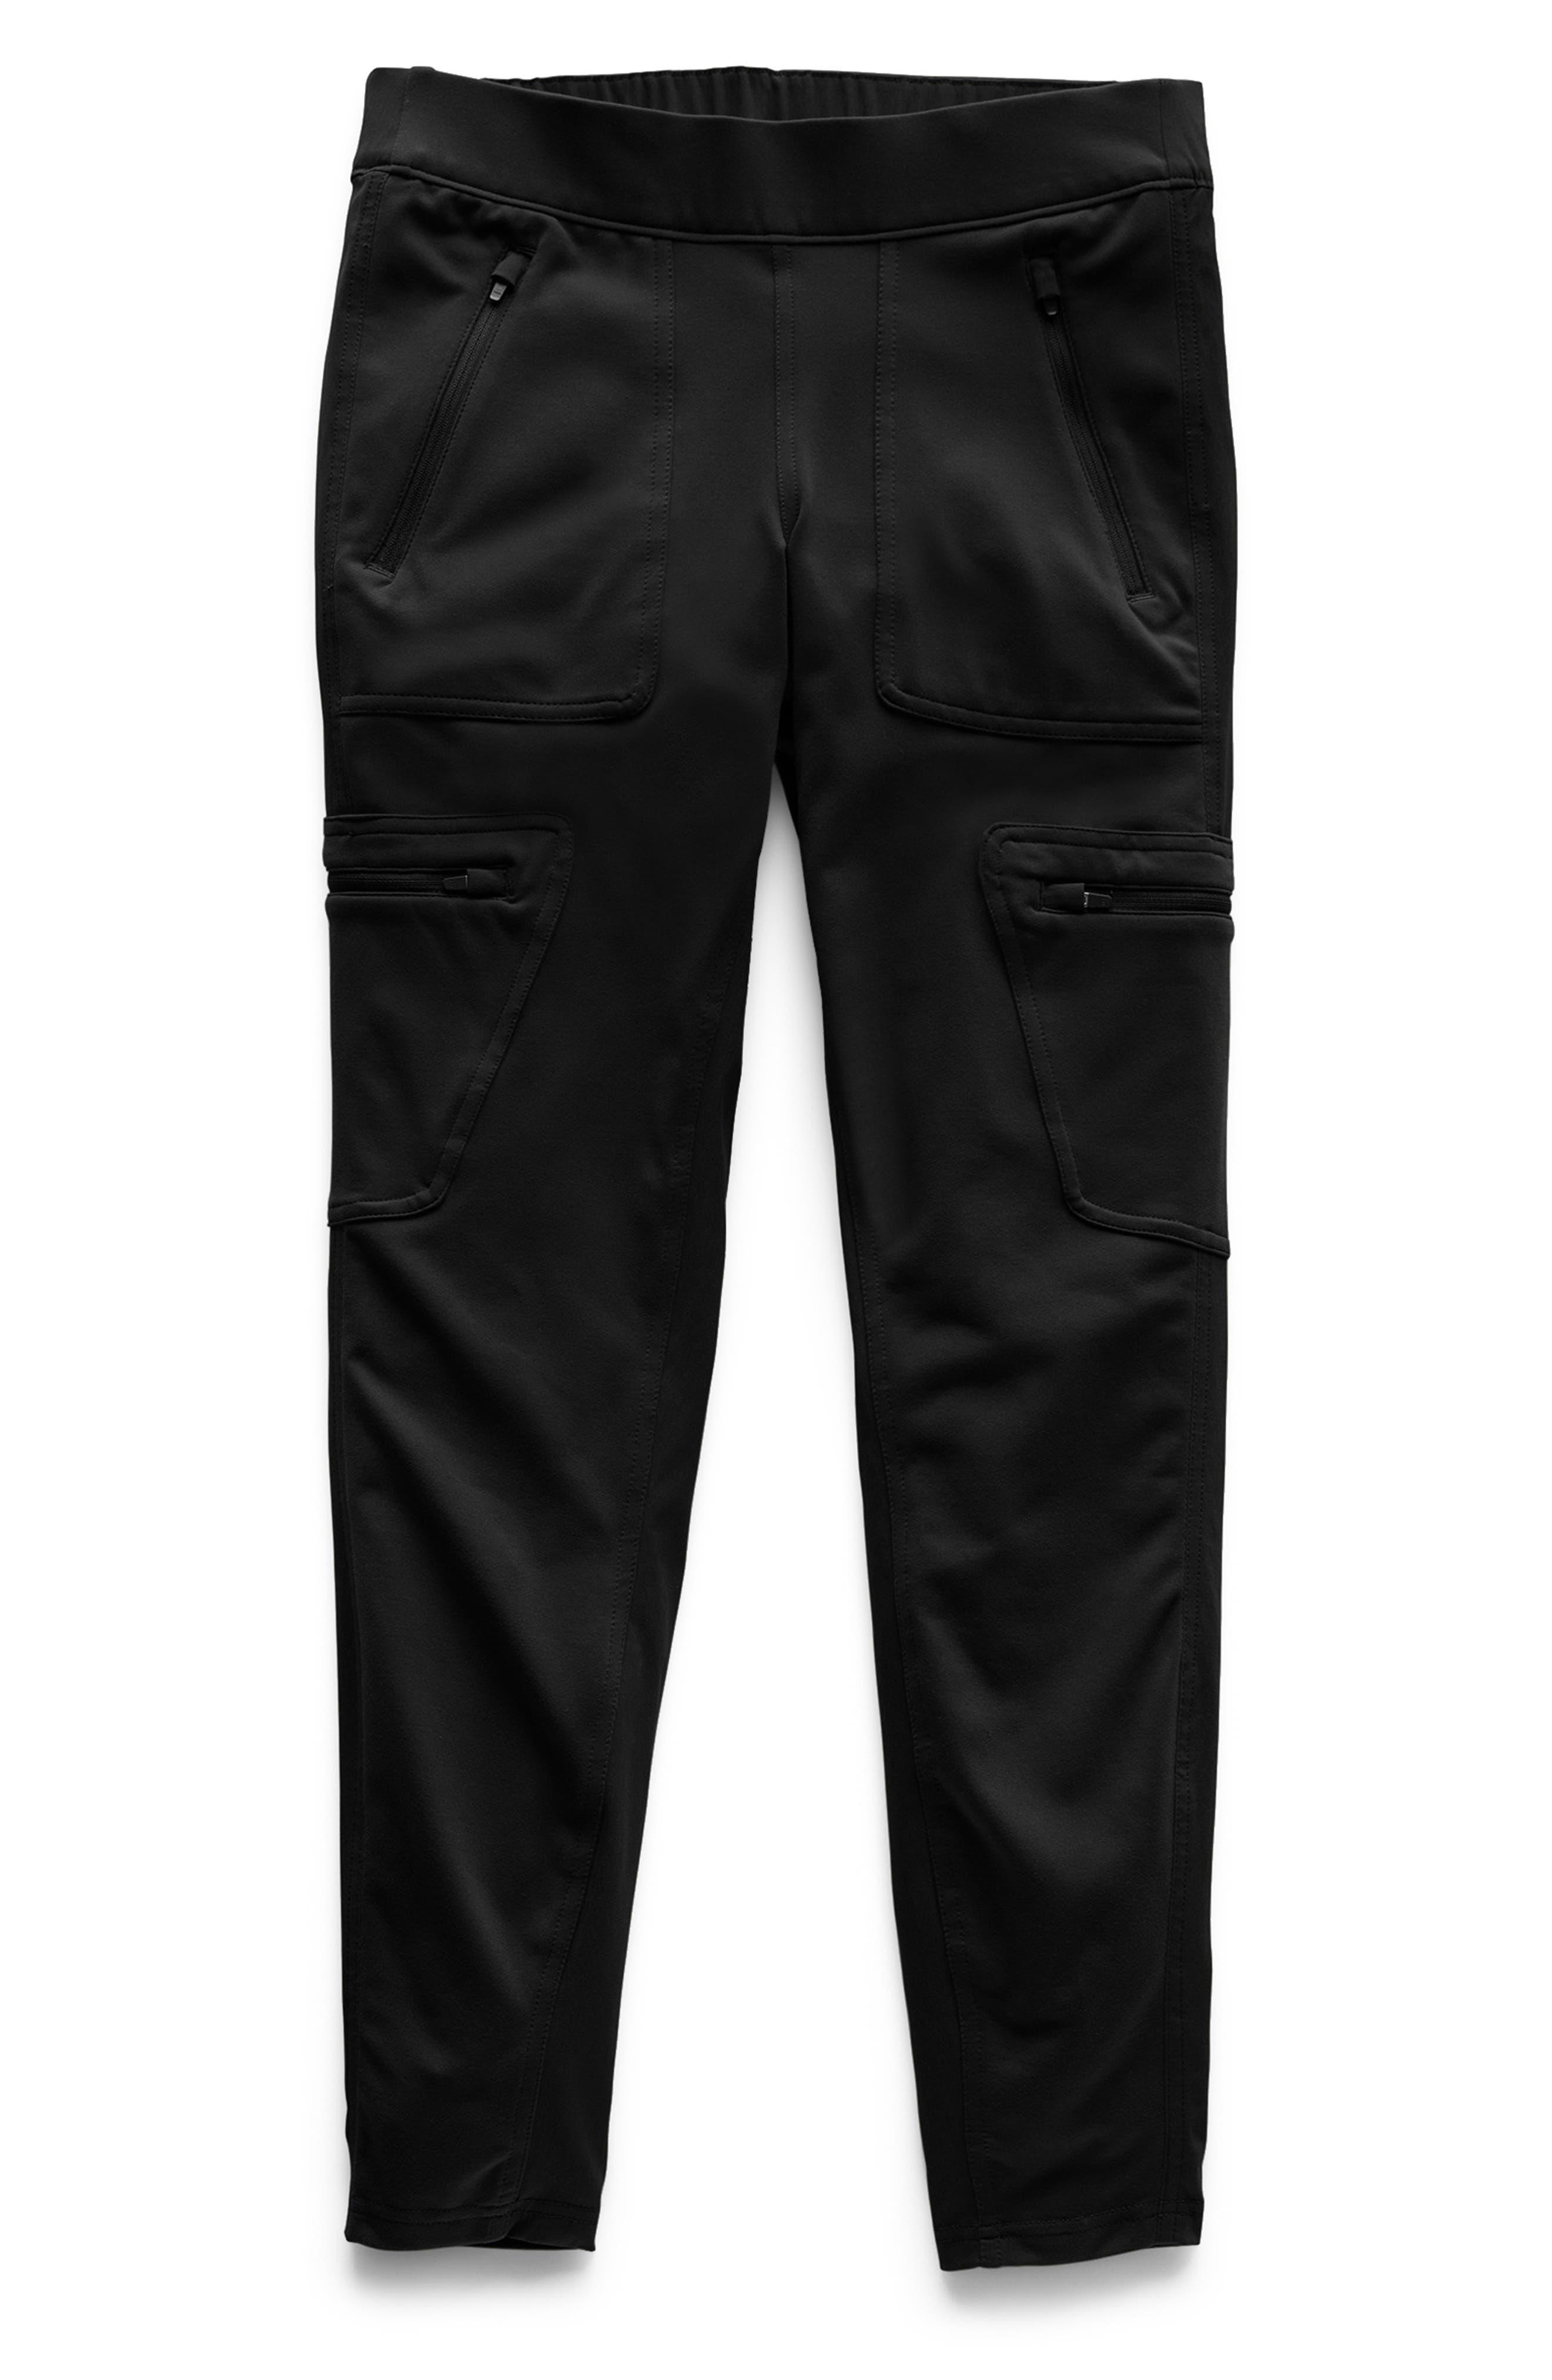 THE NORTH FACE, Utility Hybrid Hiker Pants, Main thumbnail 1, color, TNF BLACK